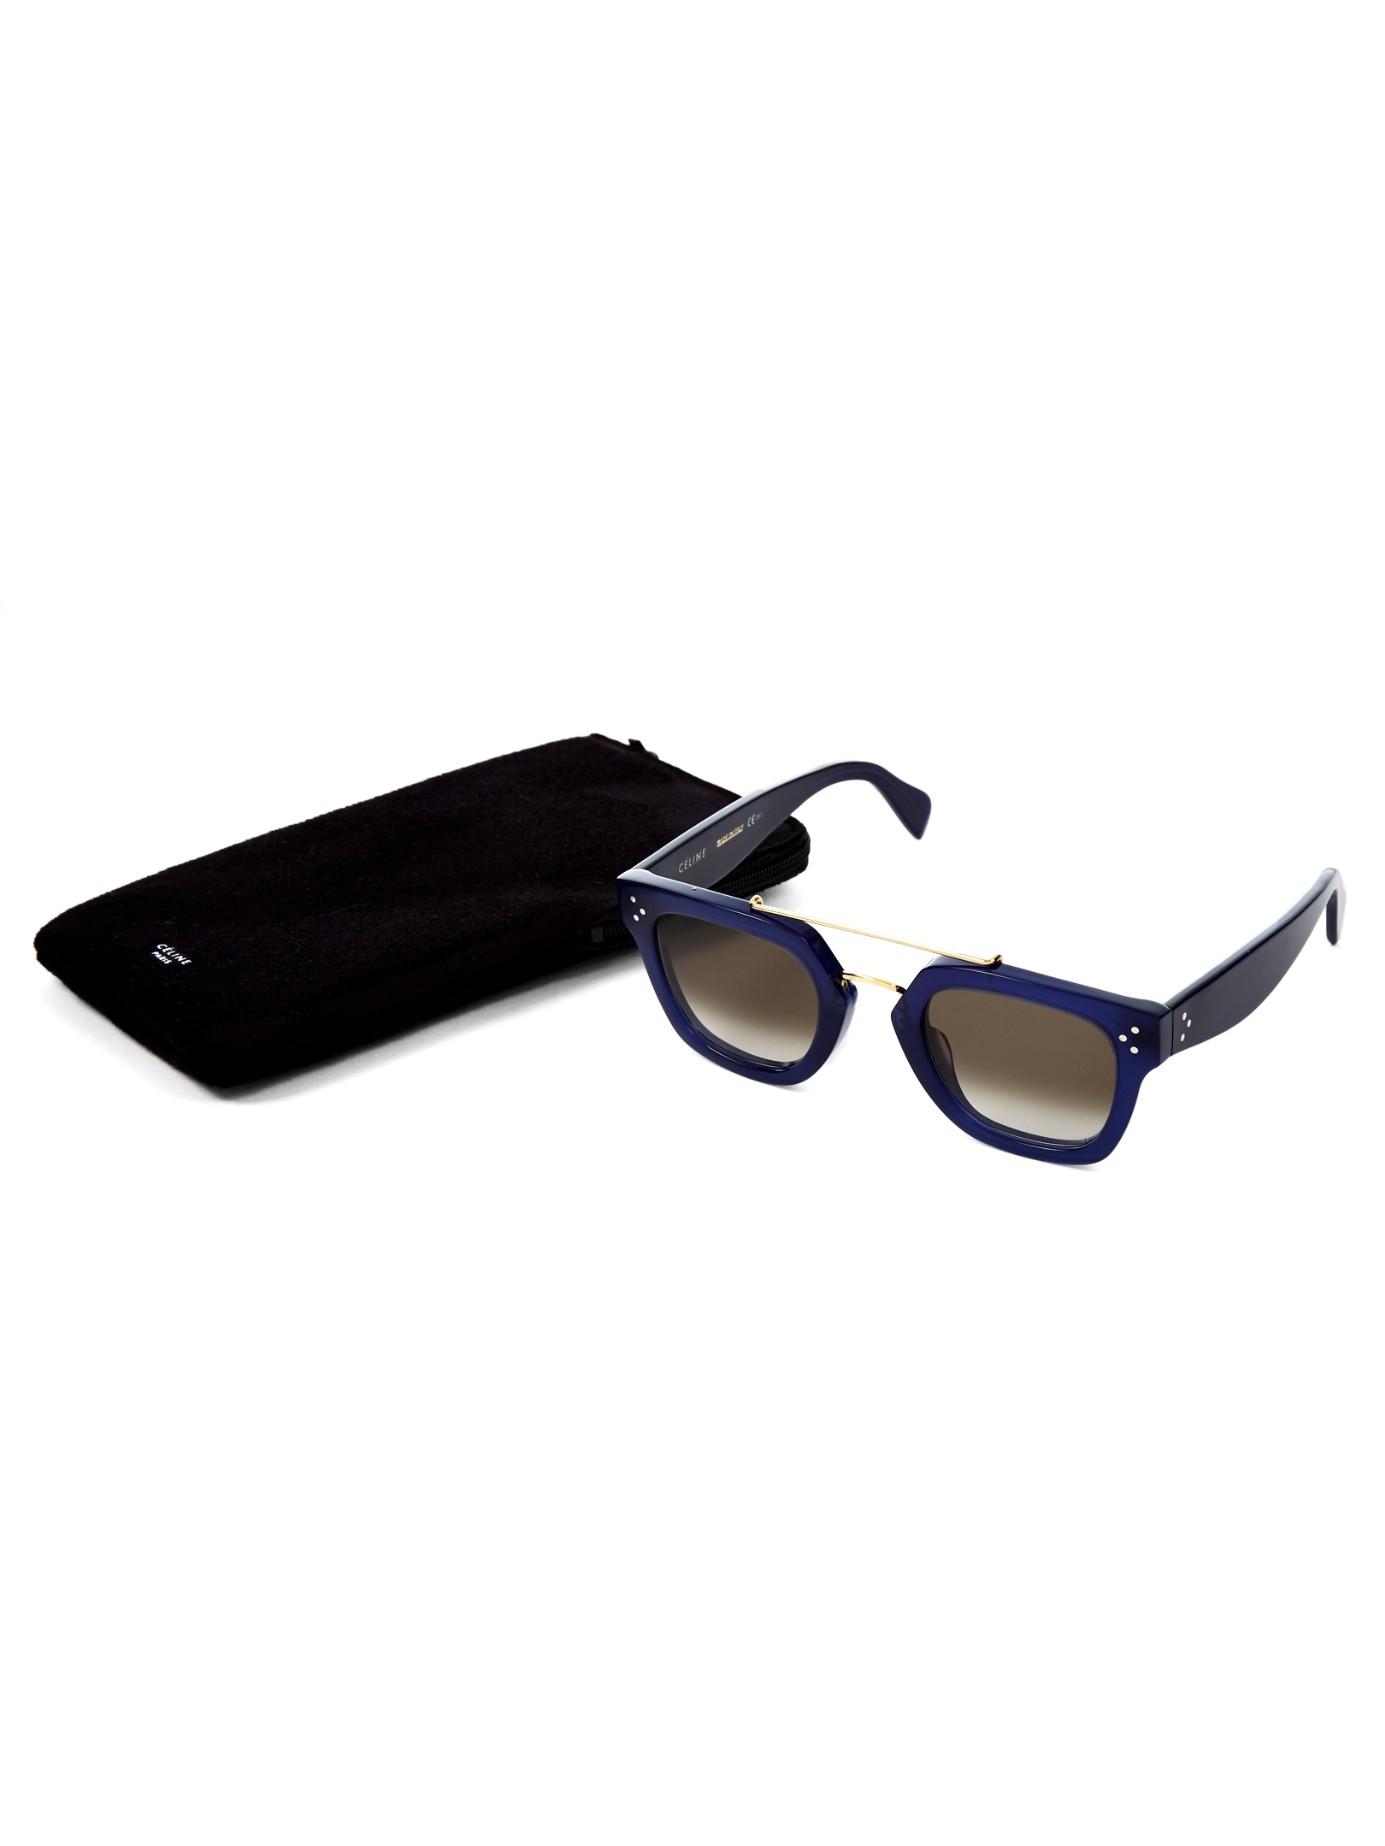 09ba4e8a10ec Celine Navy Blue Sunglasses